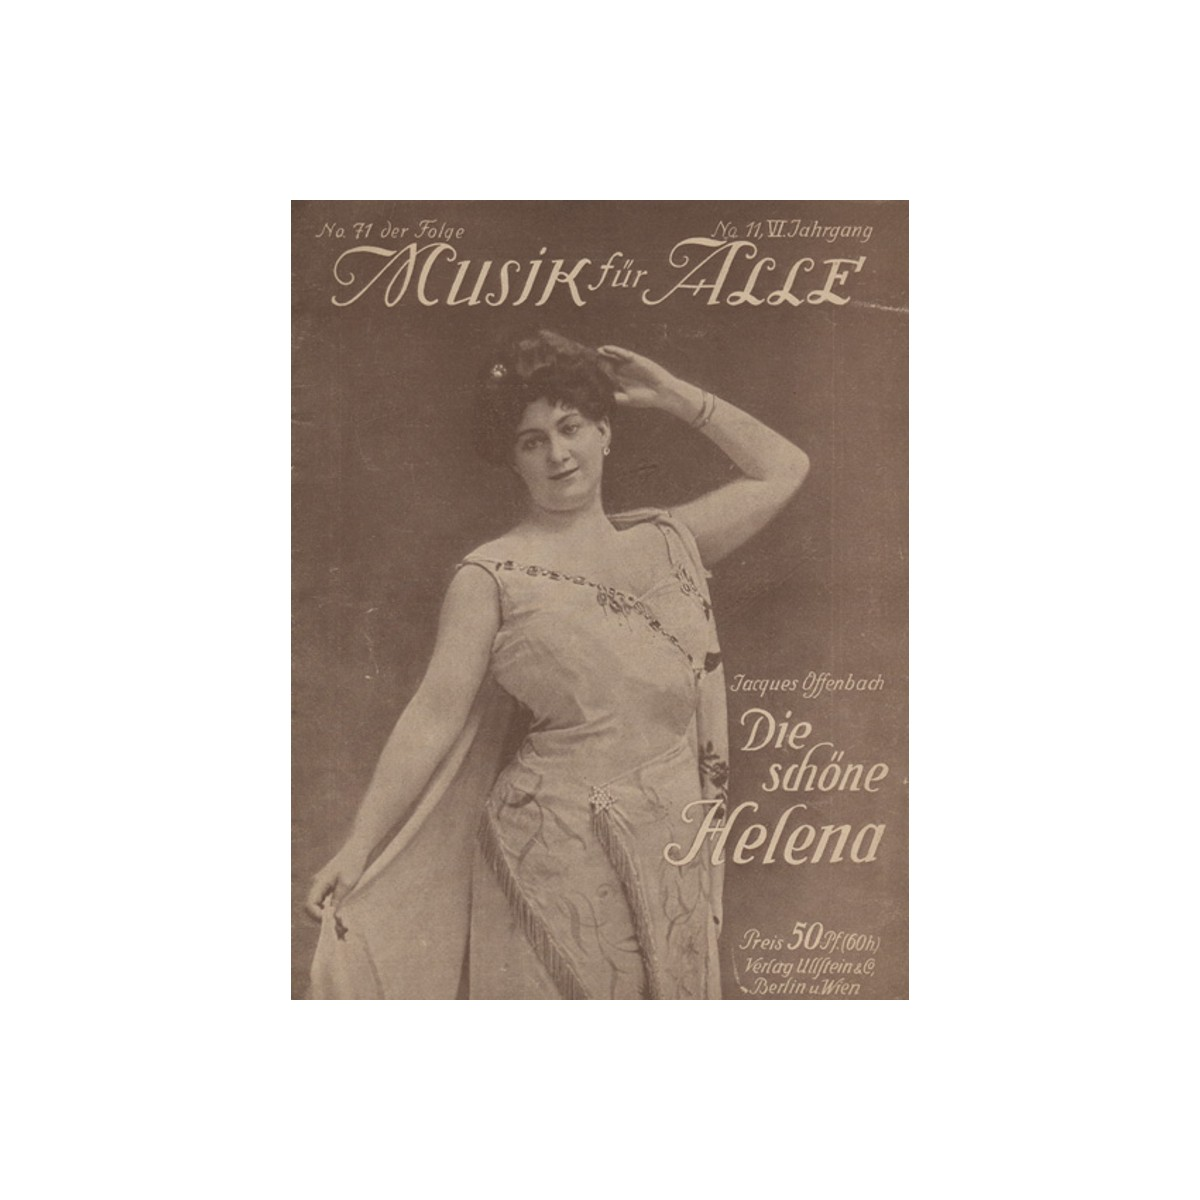 Mουσική για Oλους, Die schone Helena, Jacques Offenbach.1910